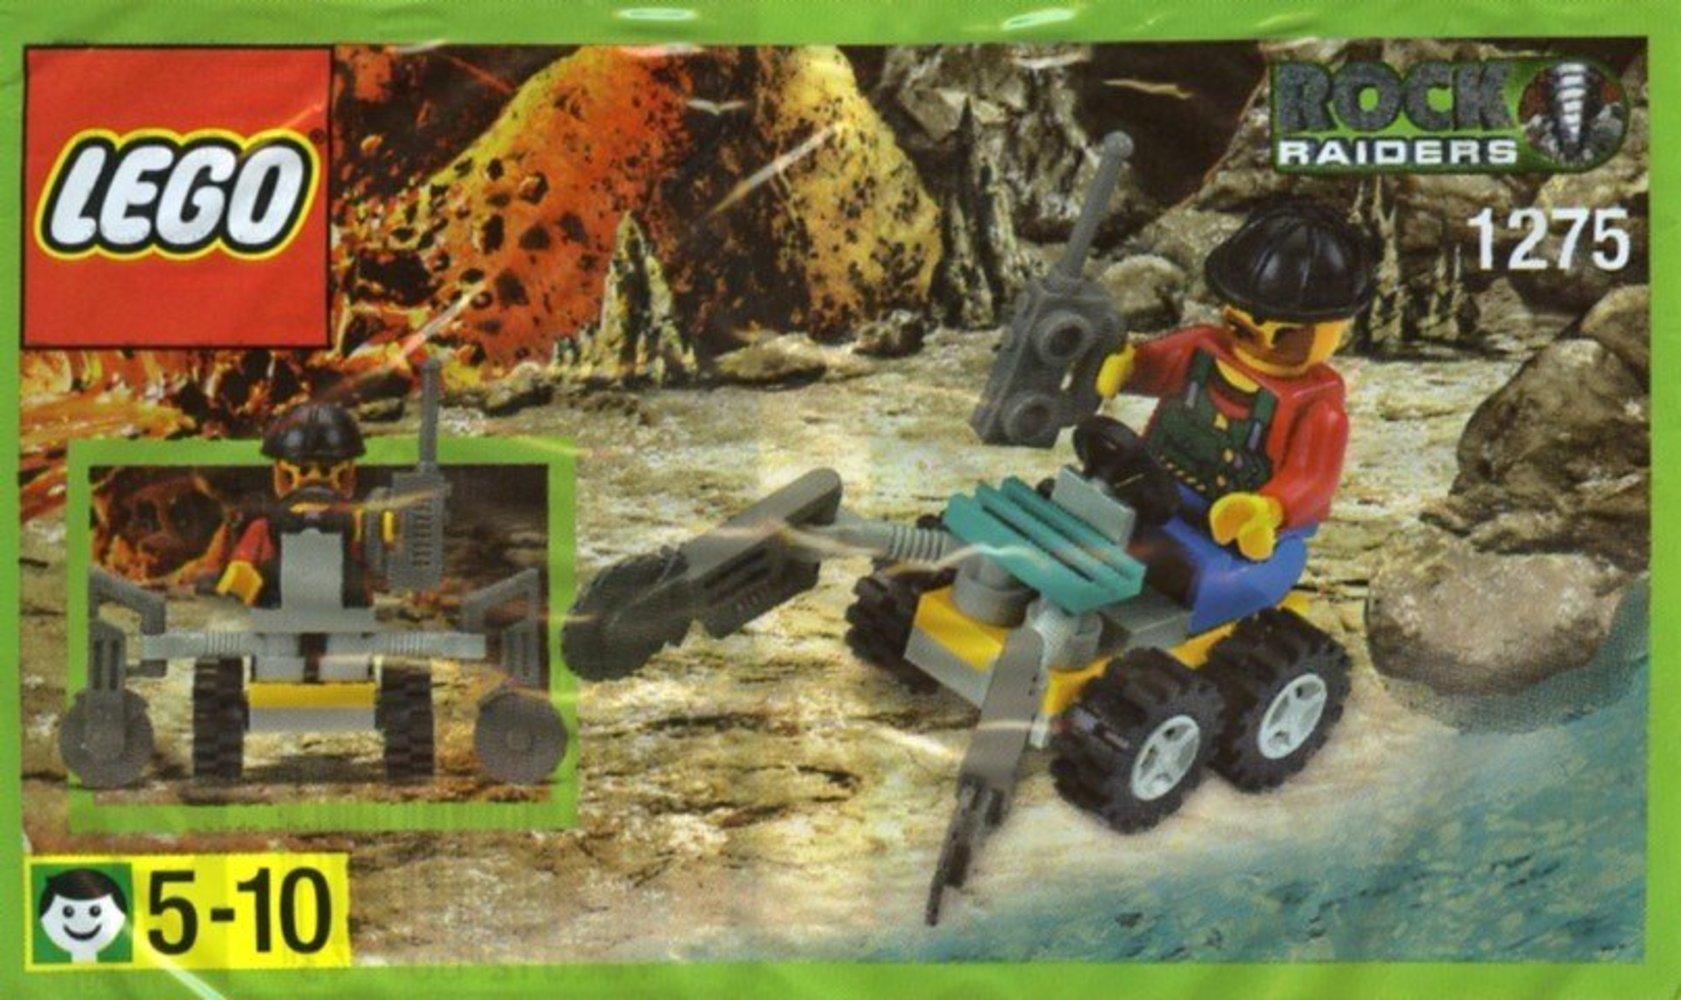 Chainsaw Bulldozer